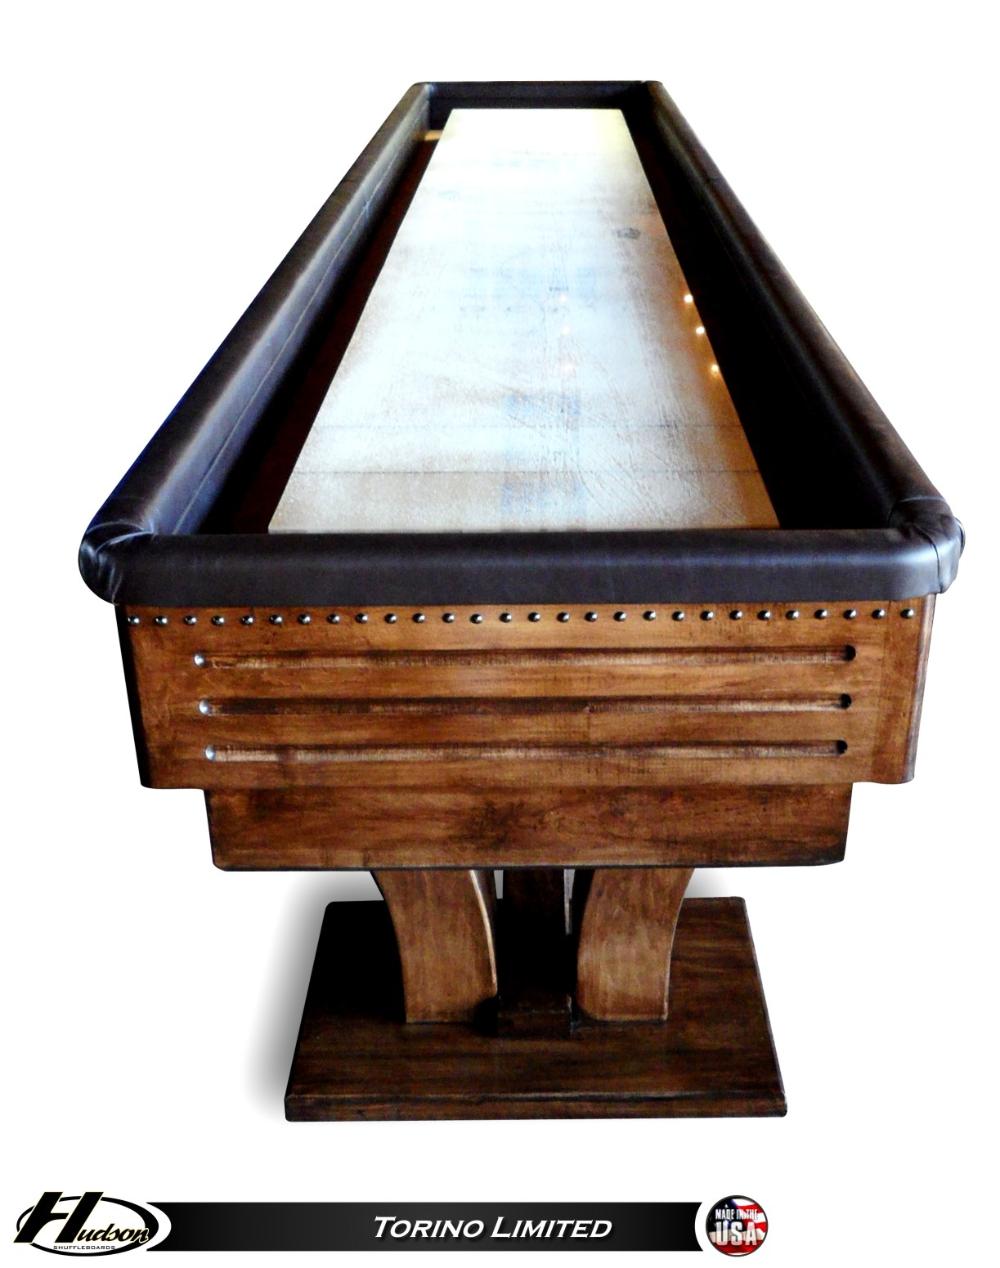 16' Torino Limited Edition Shuffleboard Table